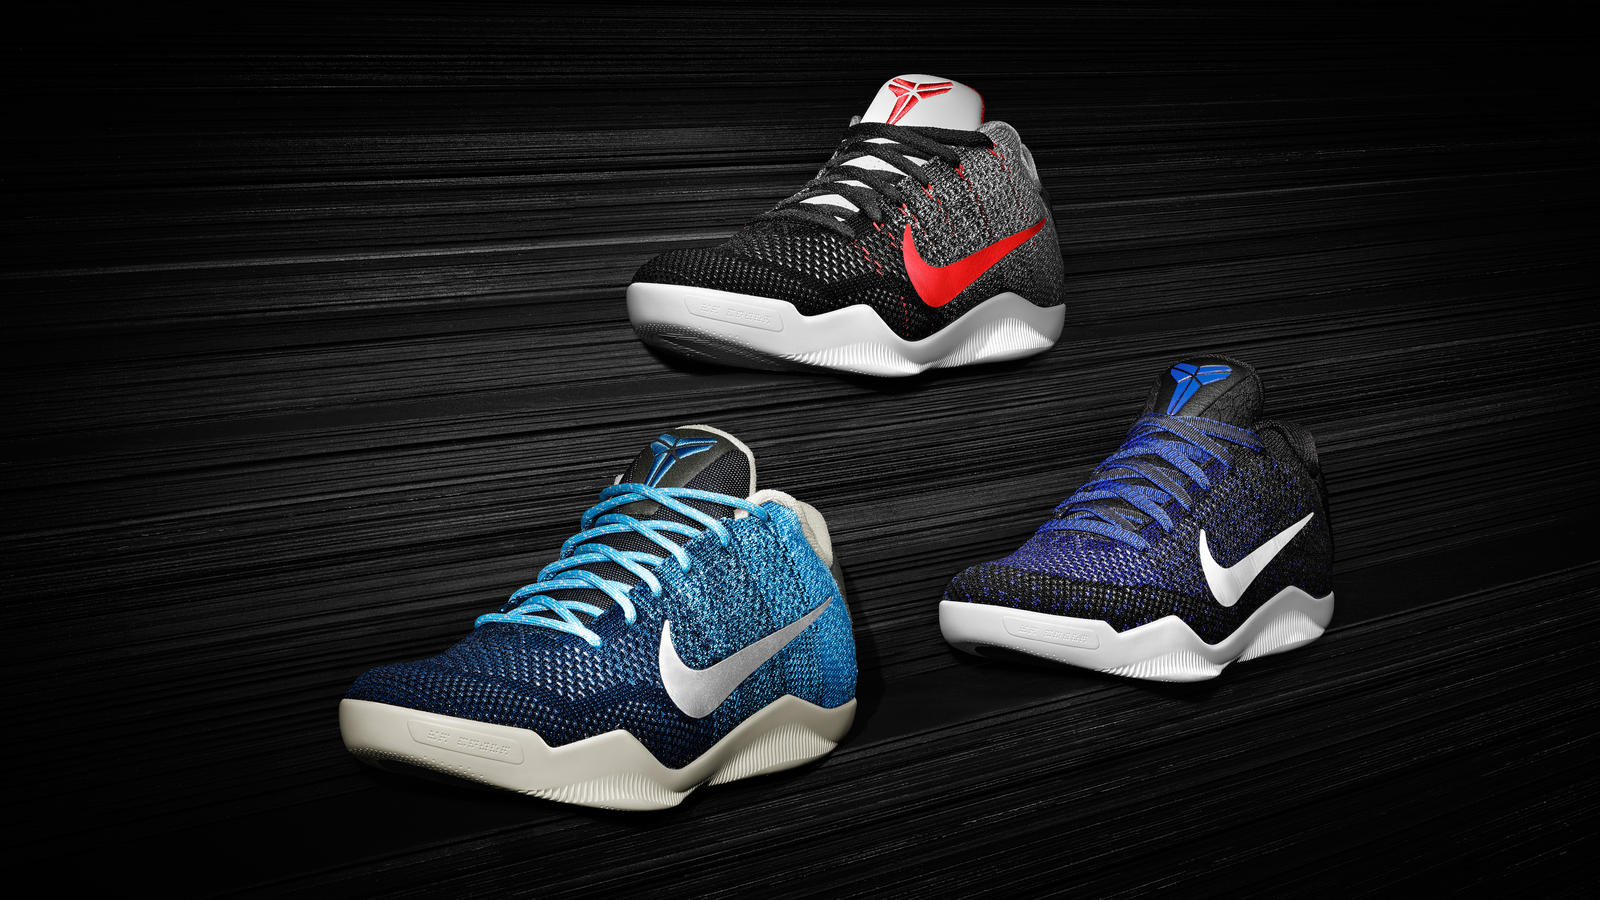 sale retailer fcfe7 b3e9c KOBE 11 Muse Pack A New Chapter Begins - Nike News